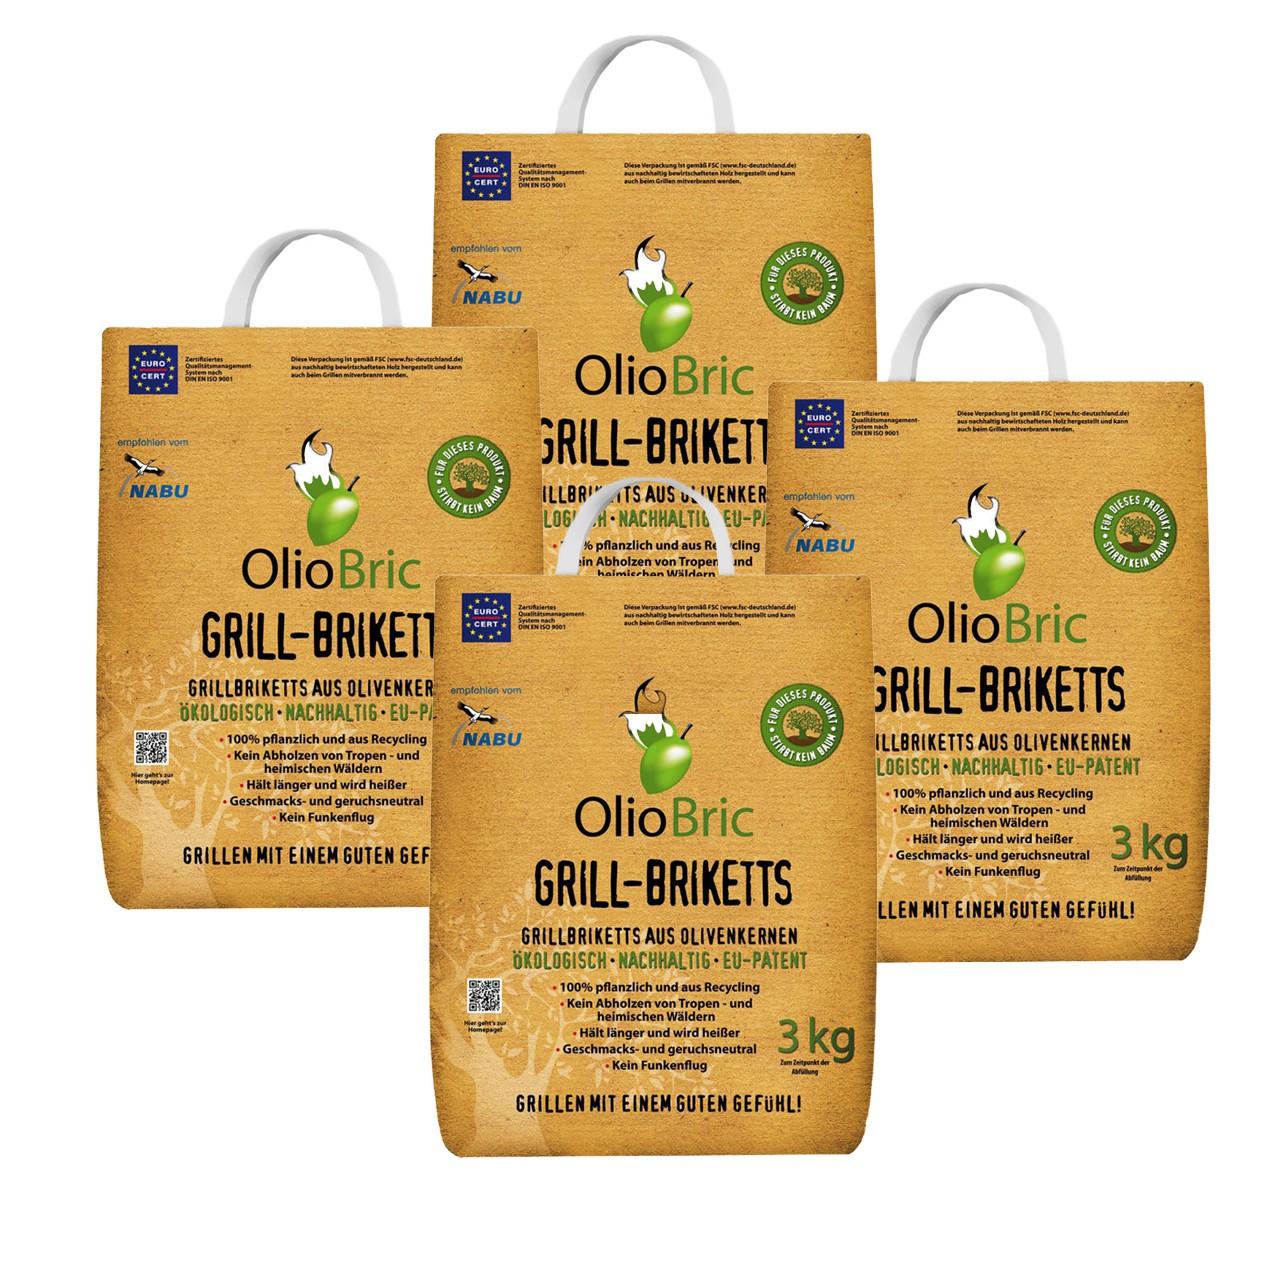 OLIOBRIC Olivenkern Grill-Briketts, 12 kg